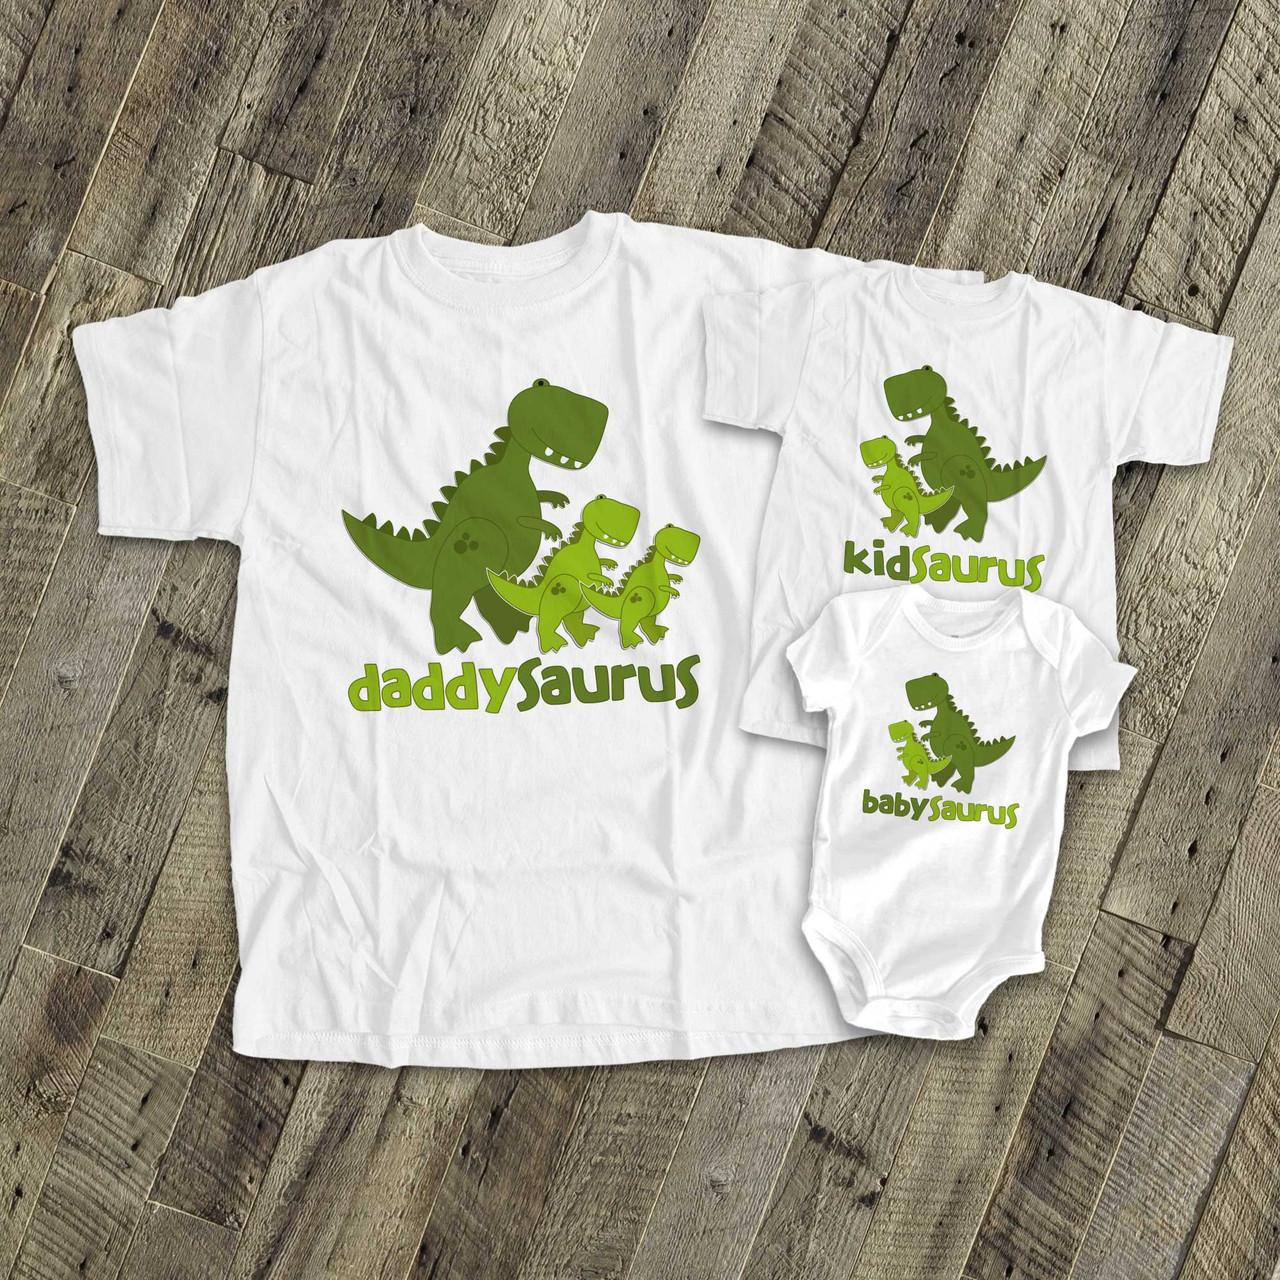 Dinosaur Trio Sketch Personalized shirt Personalized Shirt Dinosaur Sketch trio Dinosaur Shirt Summer shirt personalized